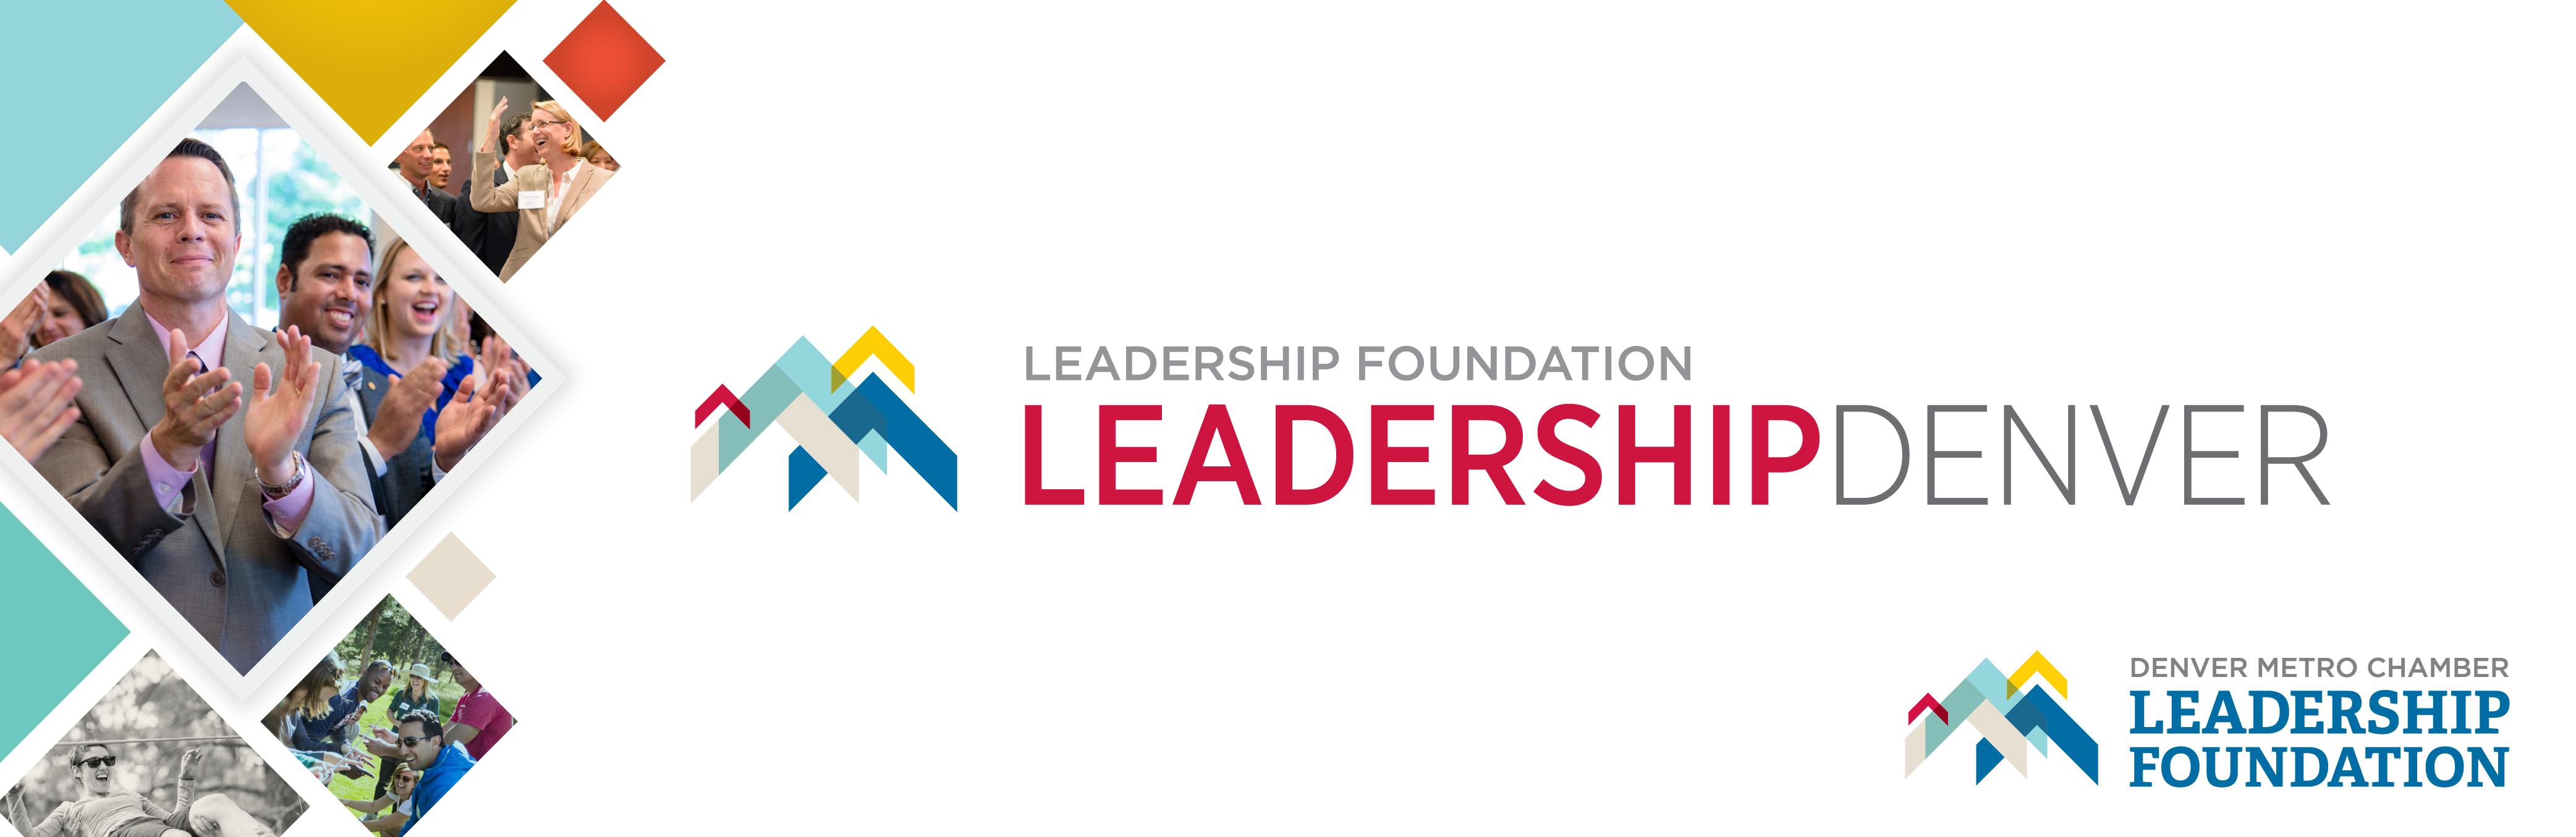 Leadership Denver 2019 Application